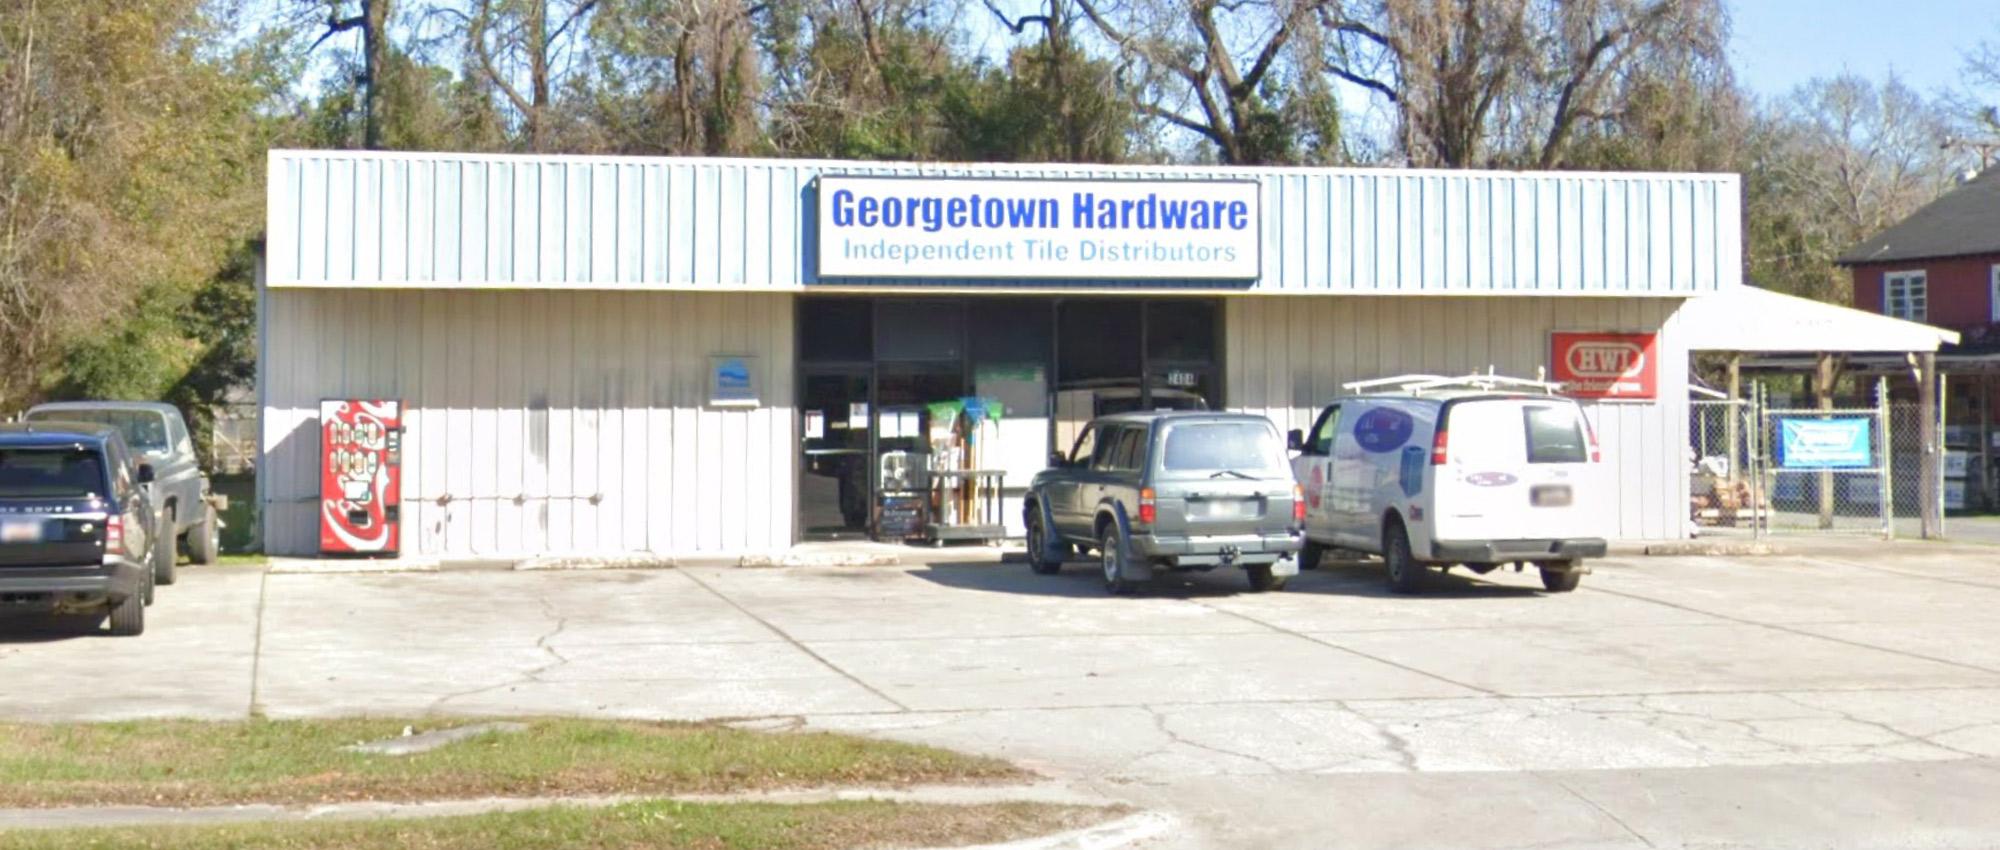 Georgetown Hardware & Independent Tile